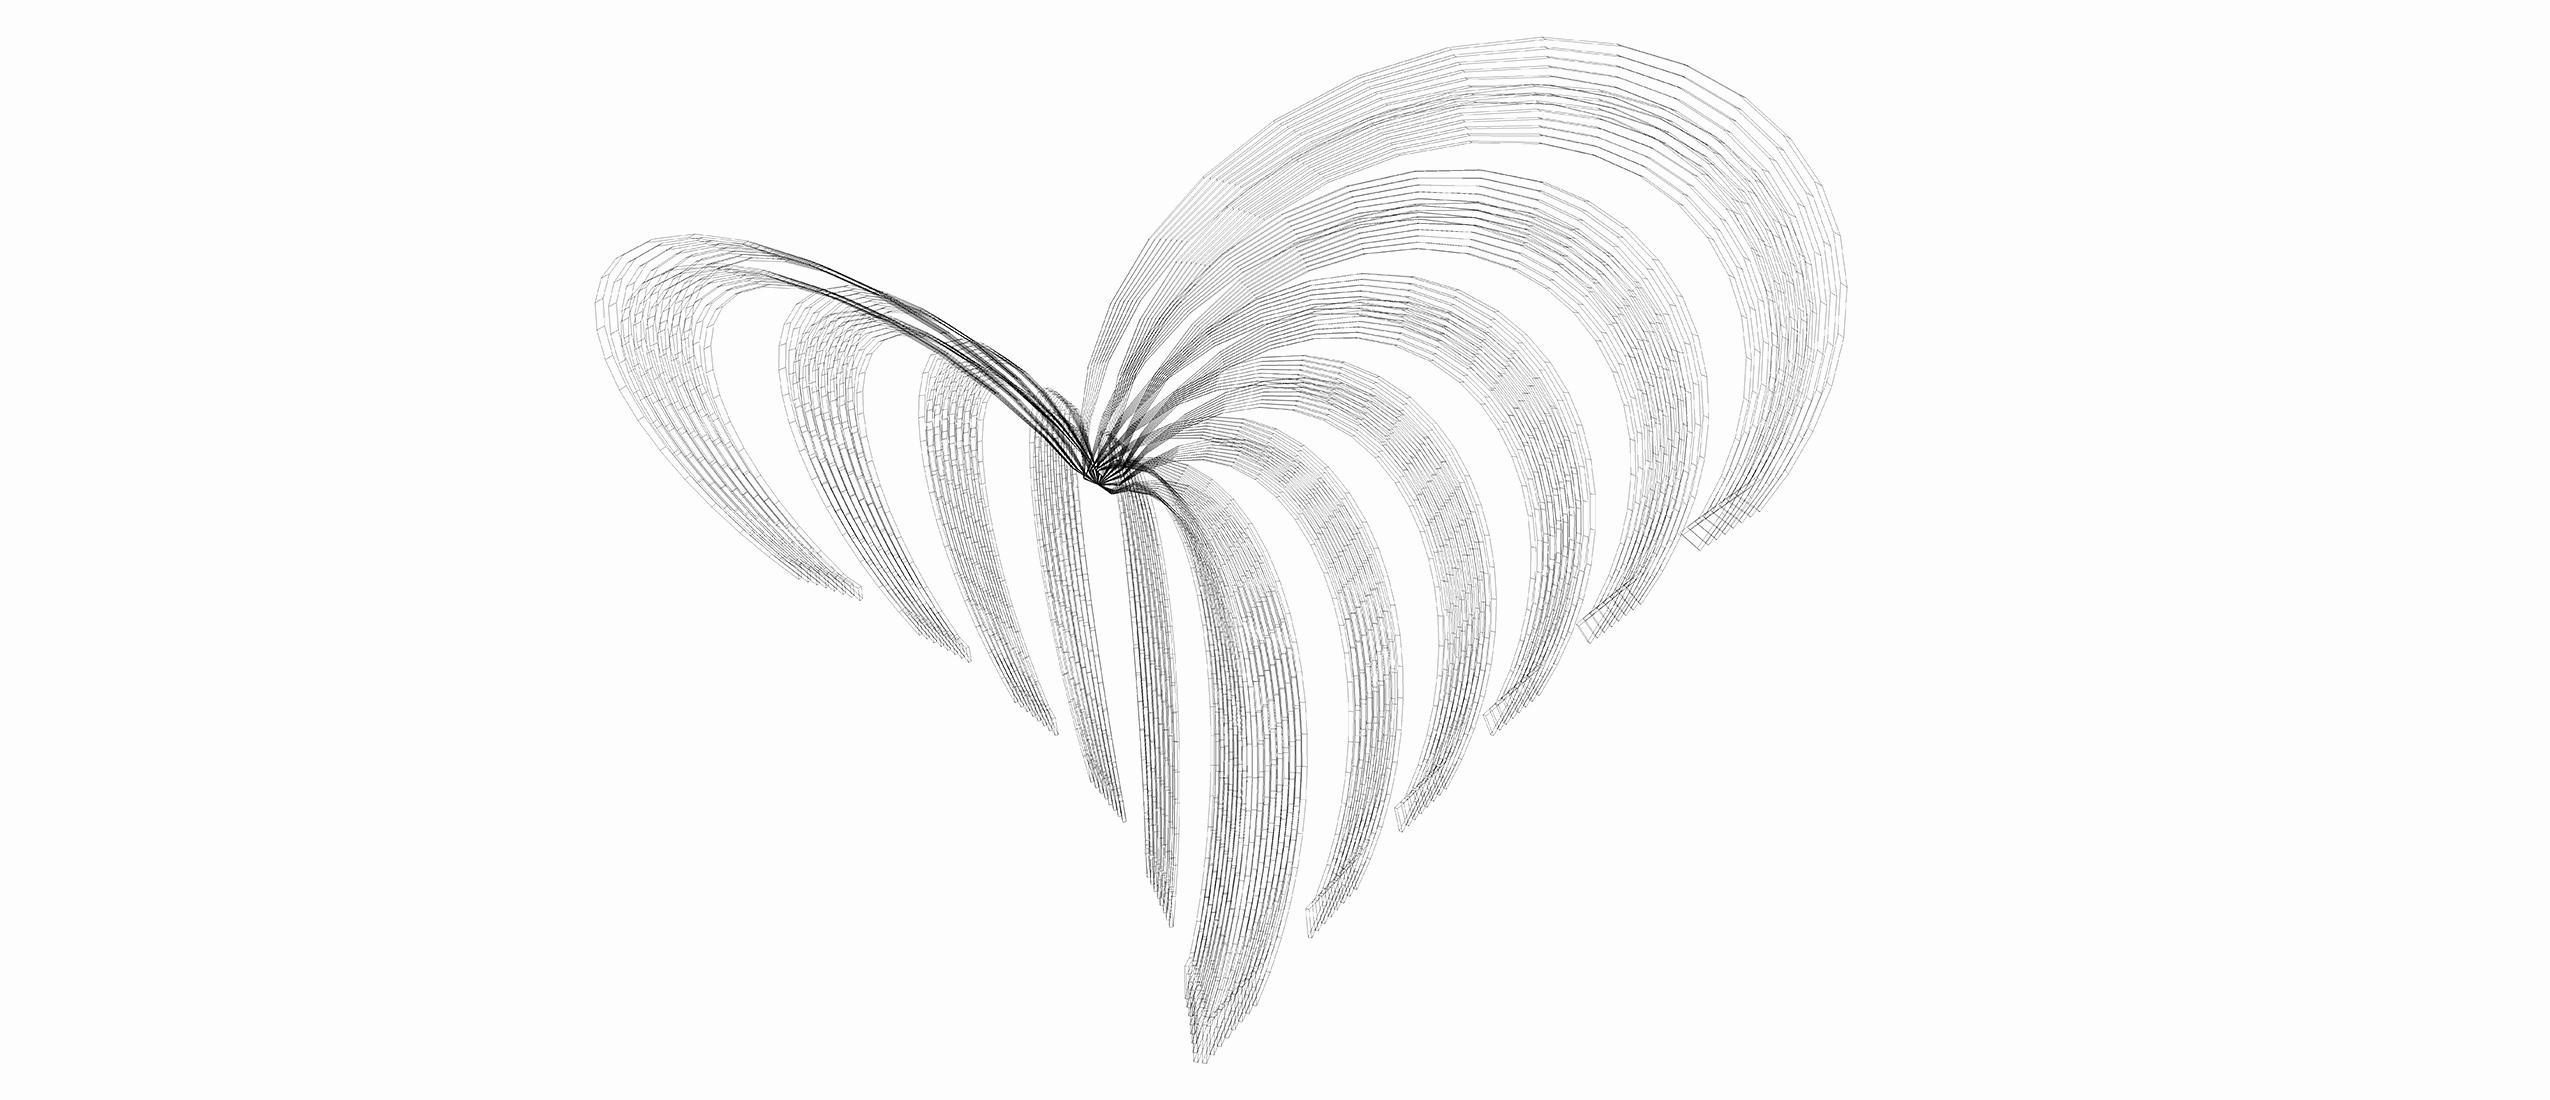 Drawing Of Angels Wings Unique Angel Wings